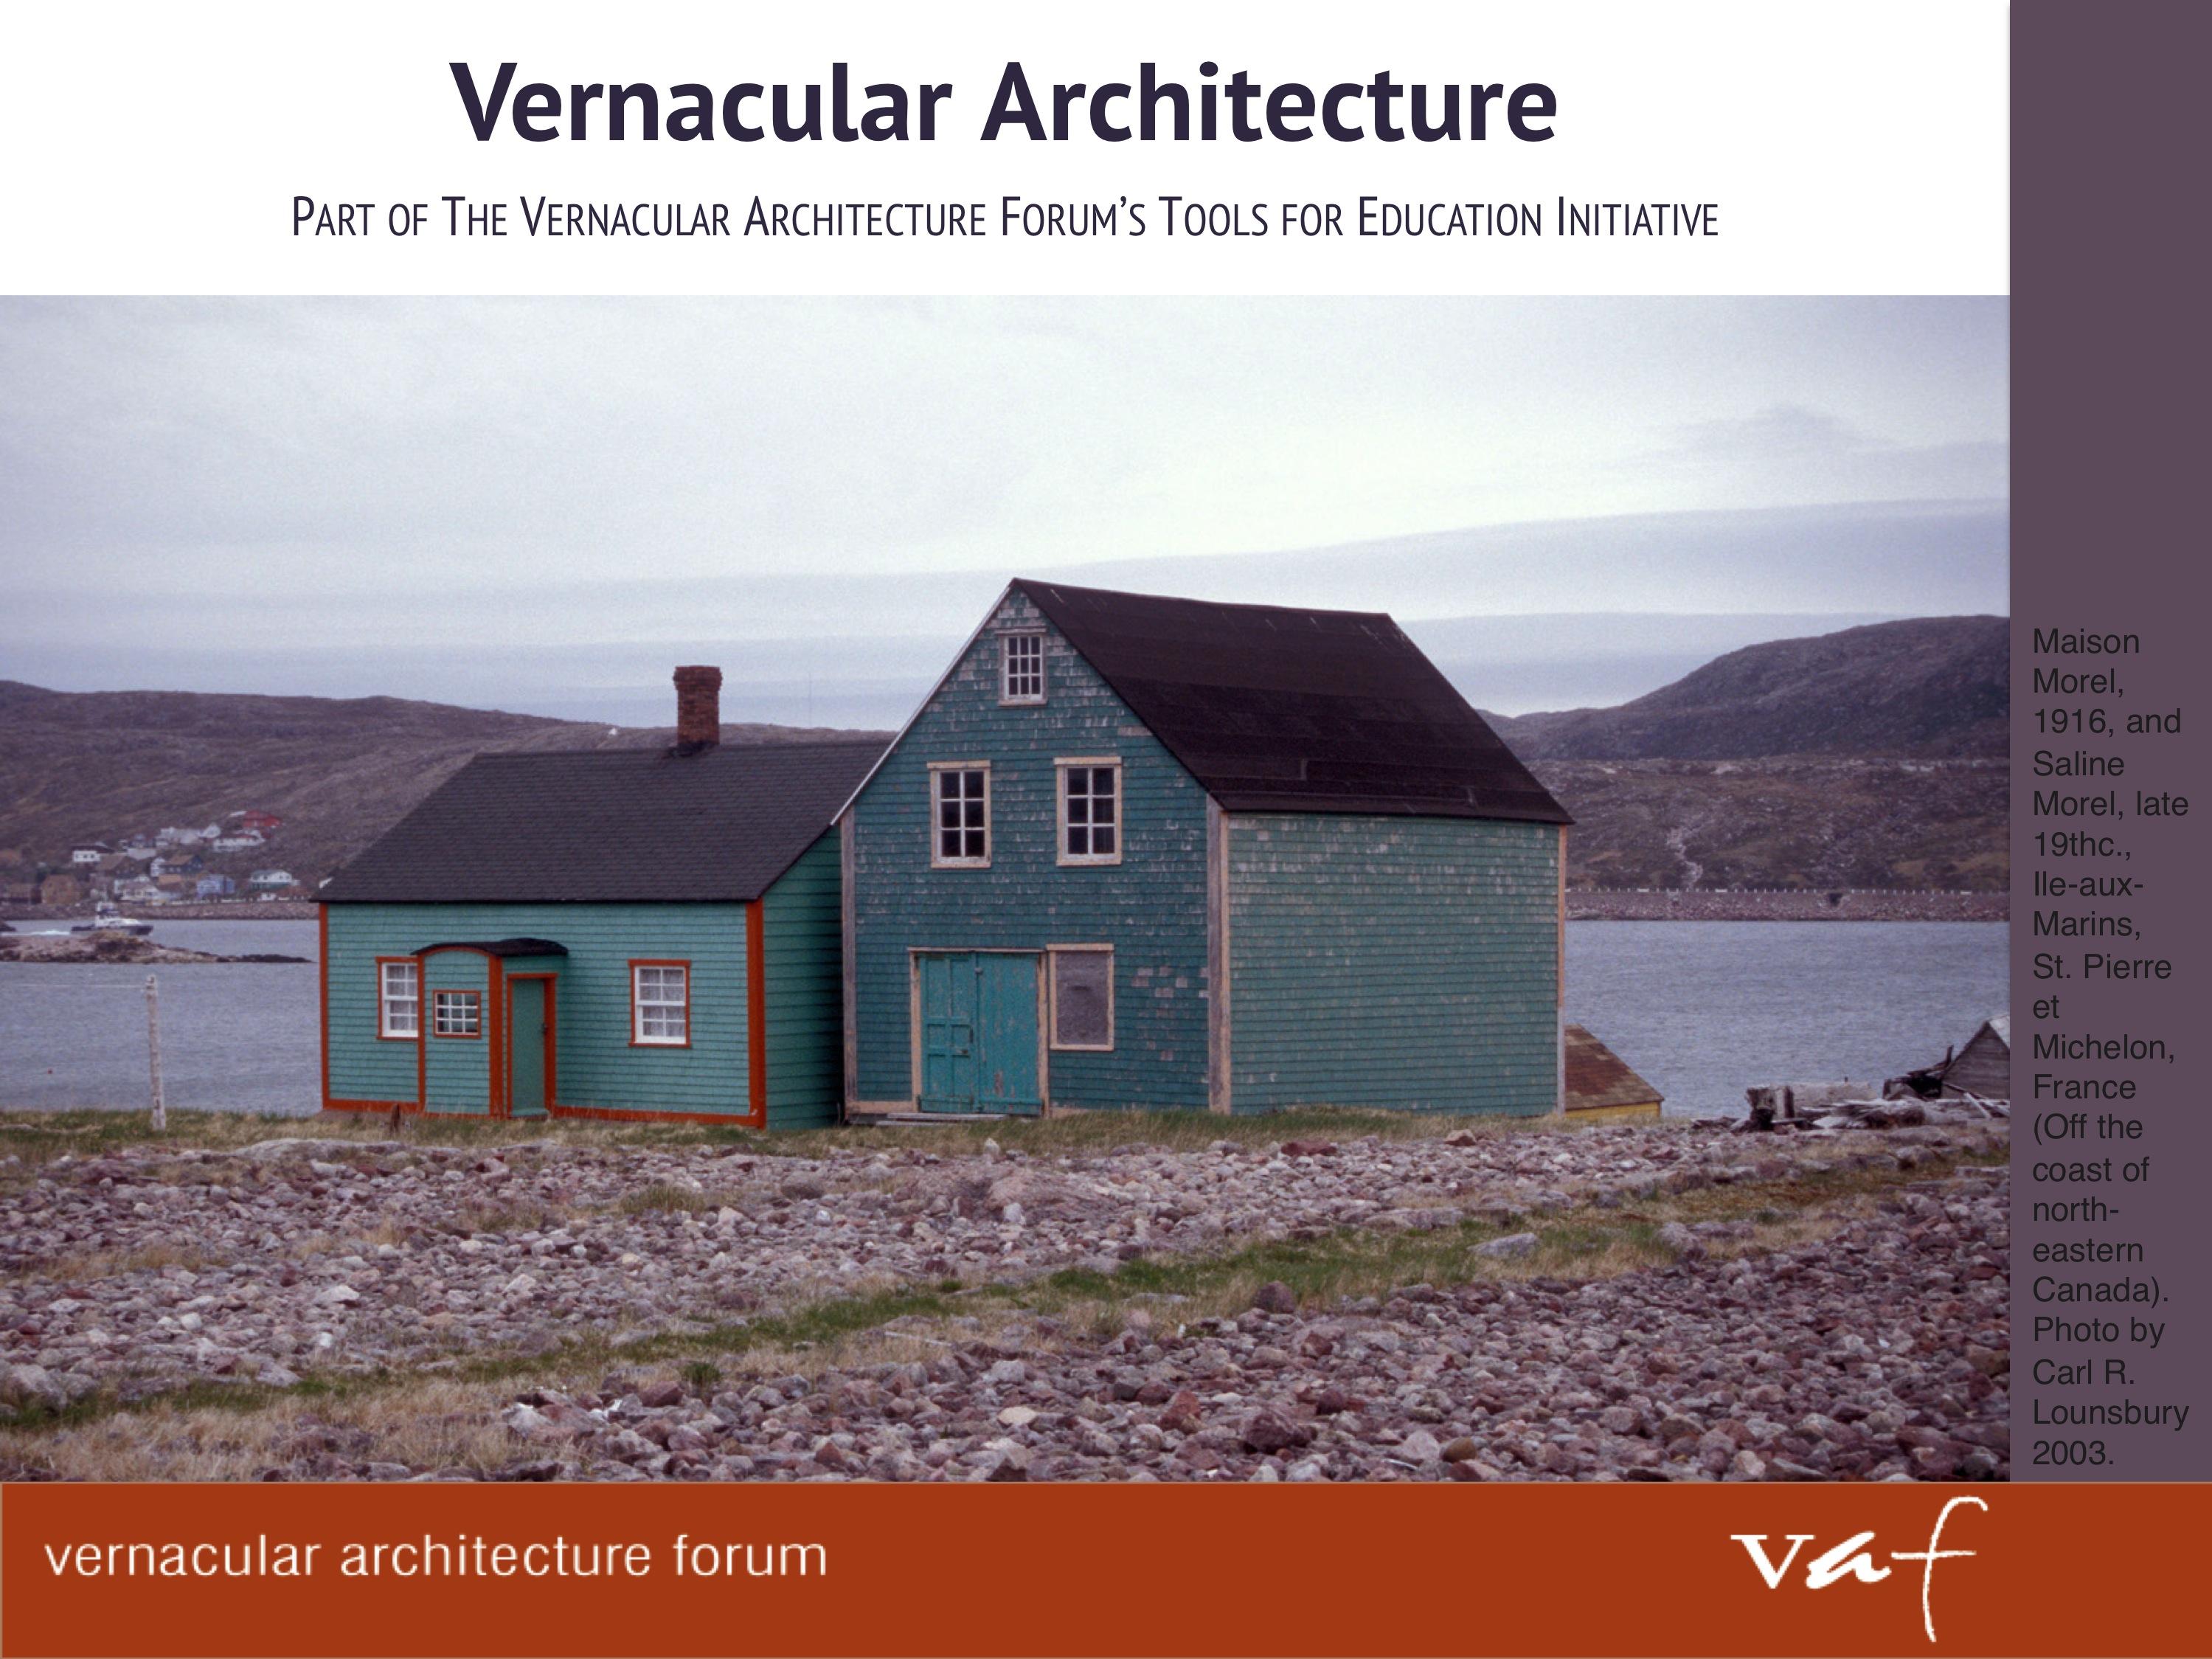 First Slide vernacular architecture forum tools for education,Invitation To Vernacular Architecture